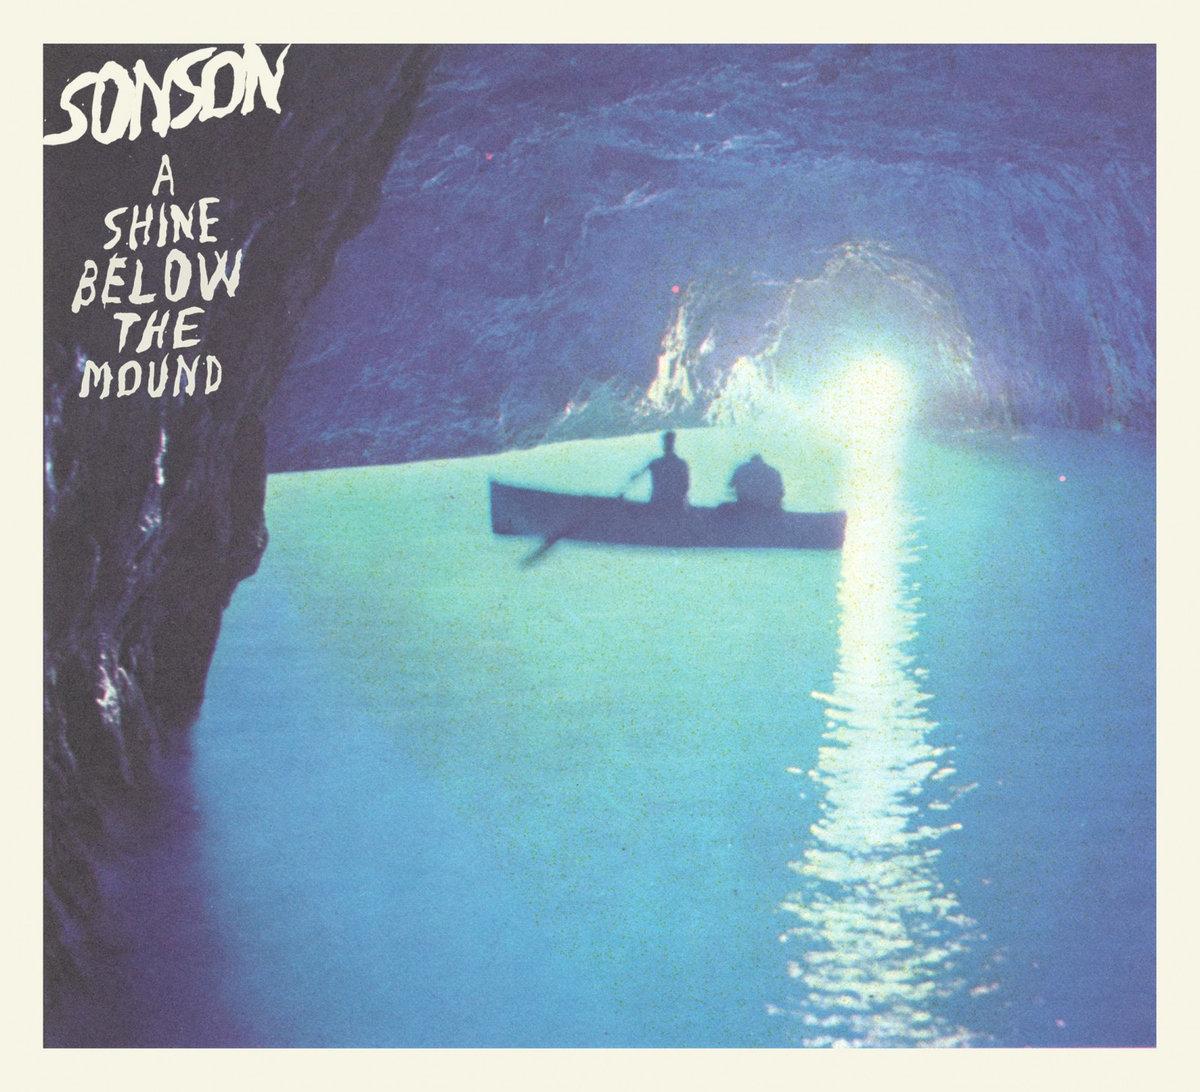 SONSON - A Shine Below The Mound